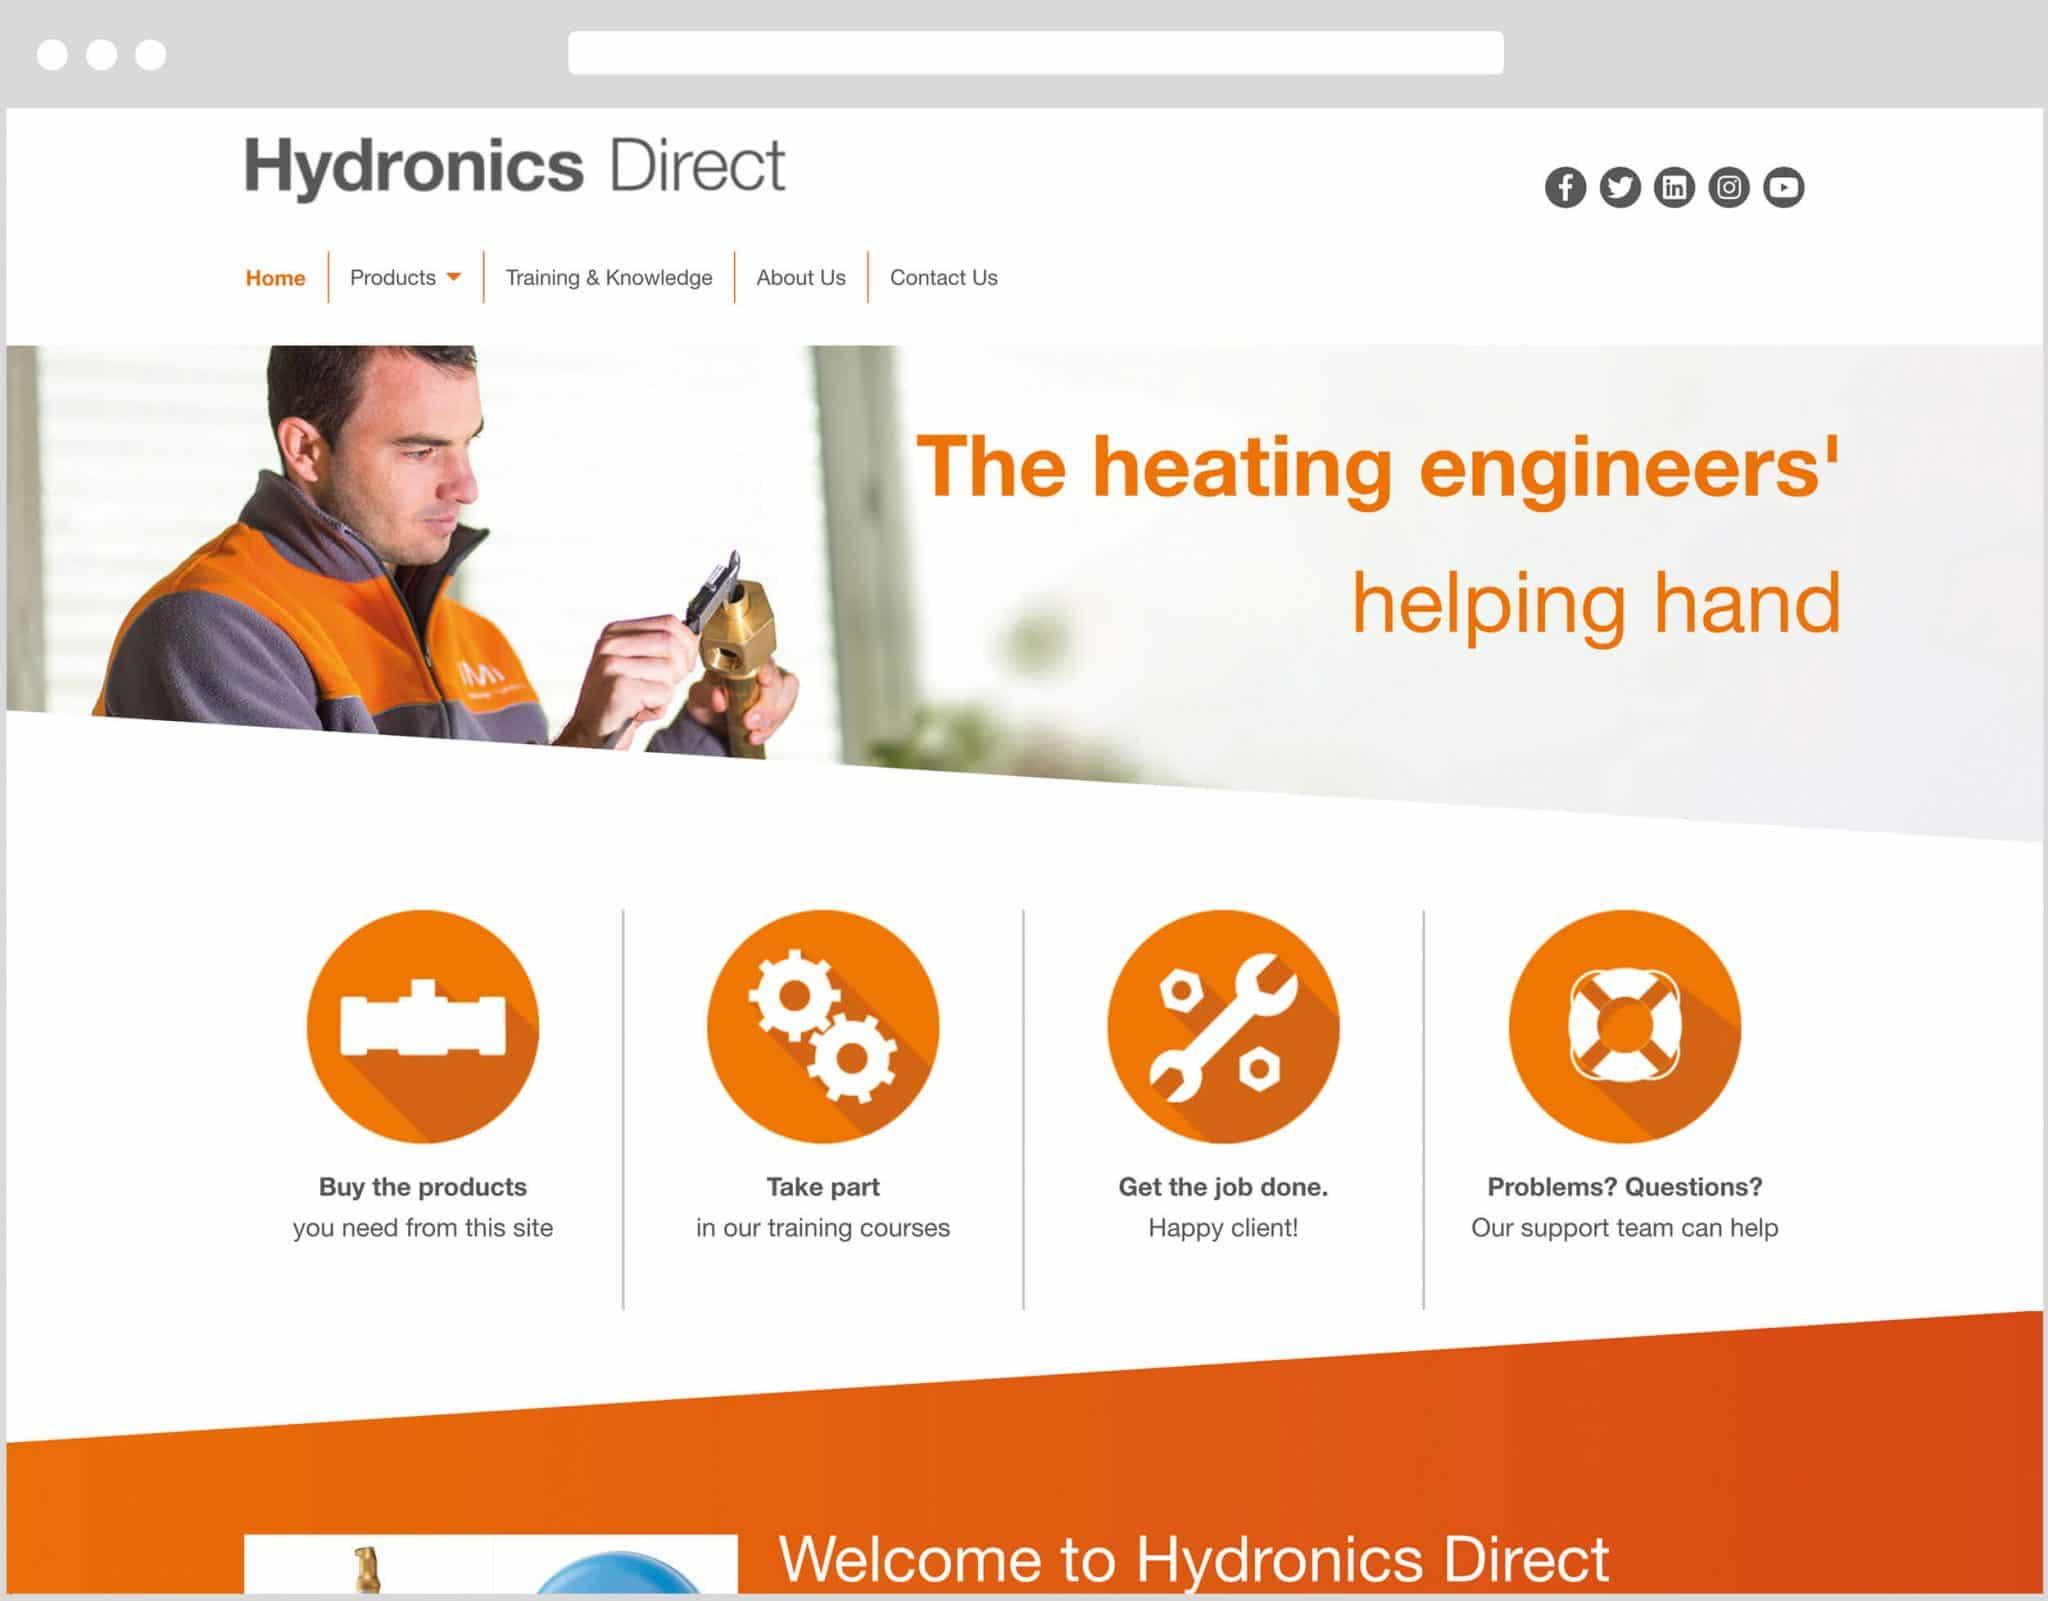 Web Design Bedfordshire - Hydronics Direct Website Build